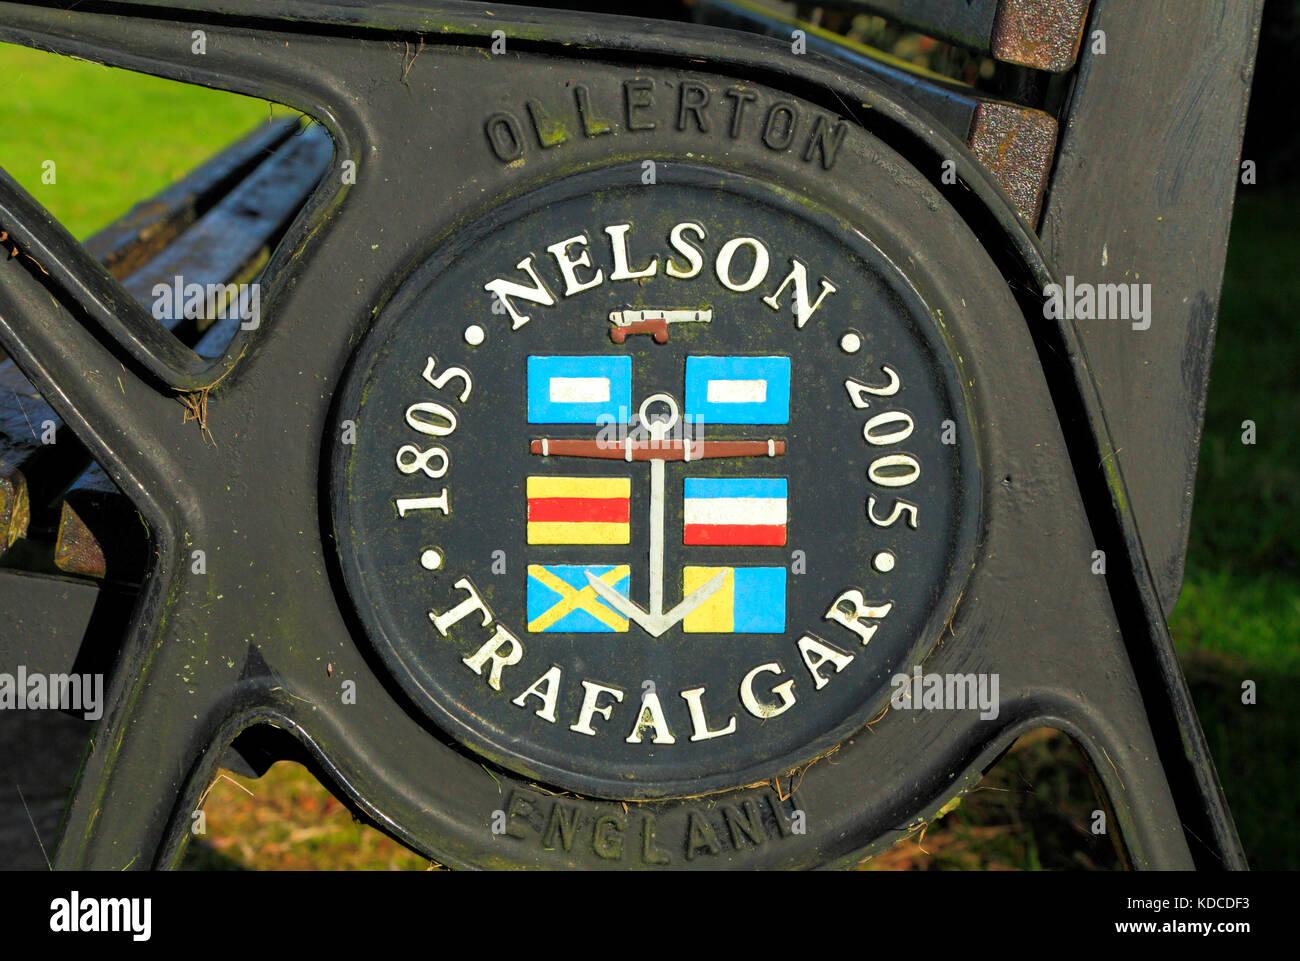 Horatio Nelson, bi-centennial plaque, Trafalgar, 1805 - 2005, Holme, Norfolk, England, UK, Lord Nelson, Admiral - Stock Image